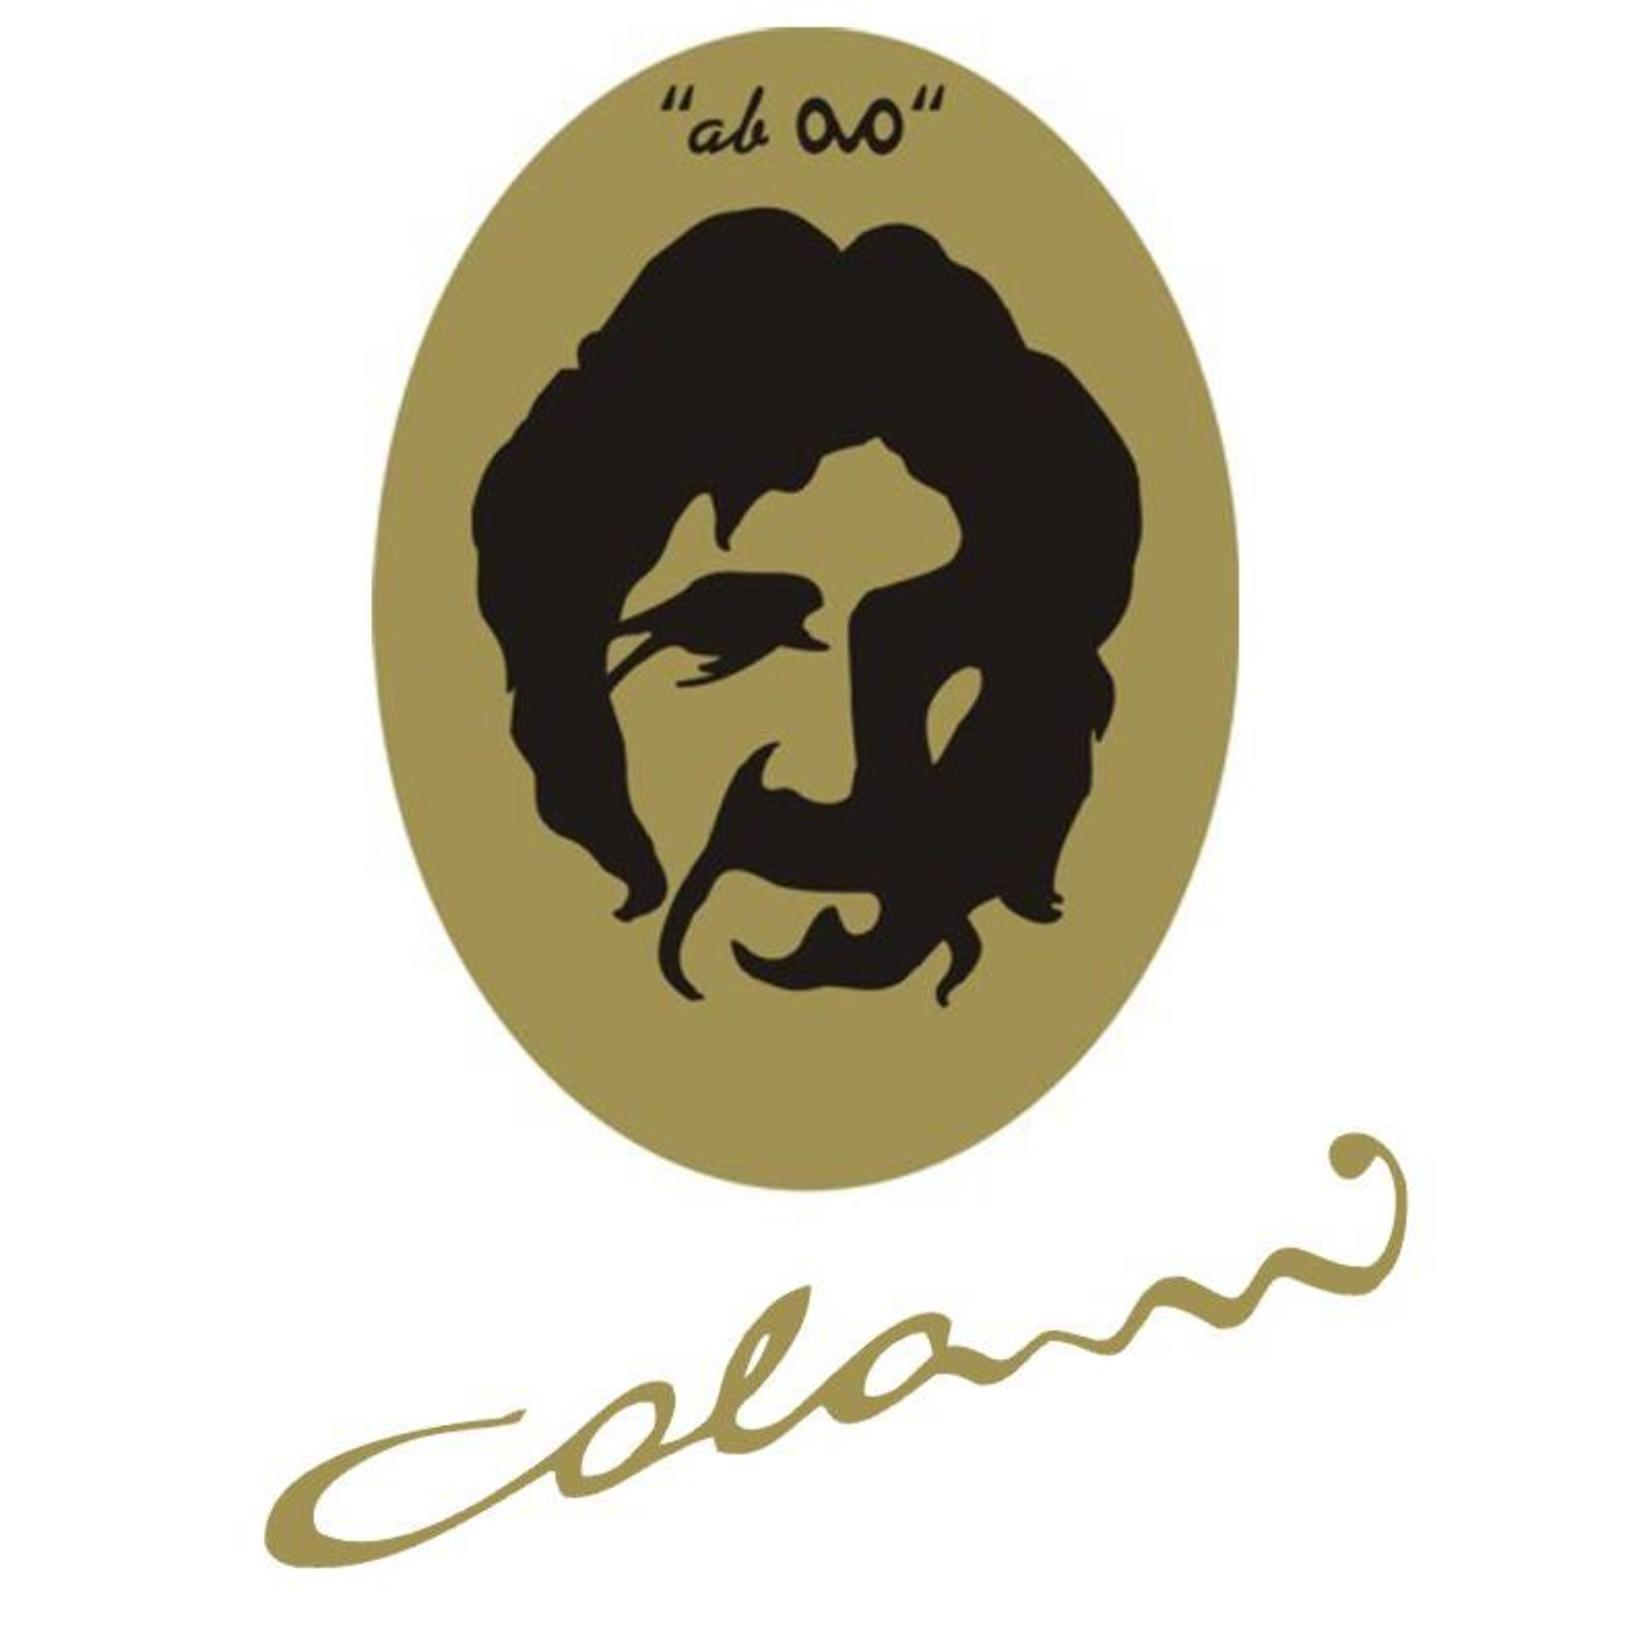 Colani Porzellanserie Luigi Colani Kaffeebecher aus Porzellan in Rot